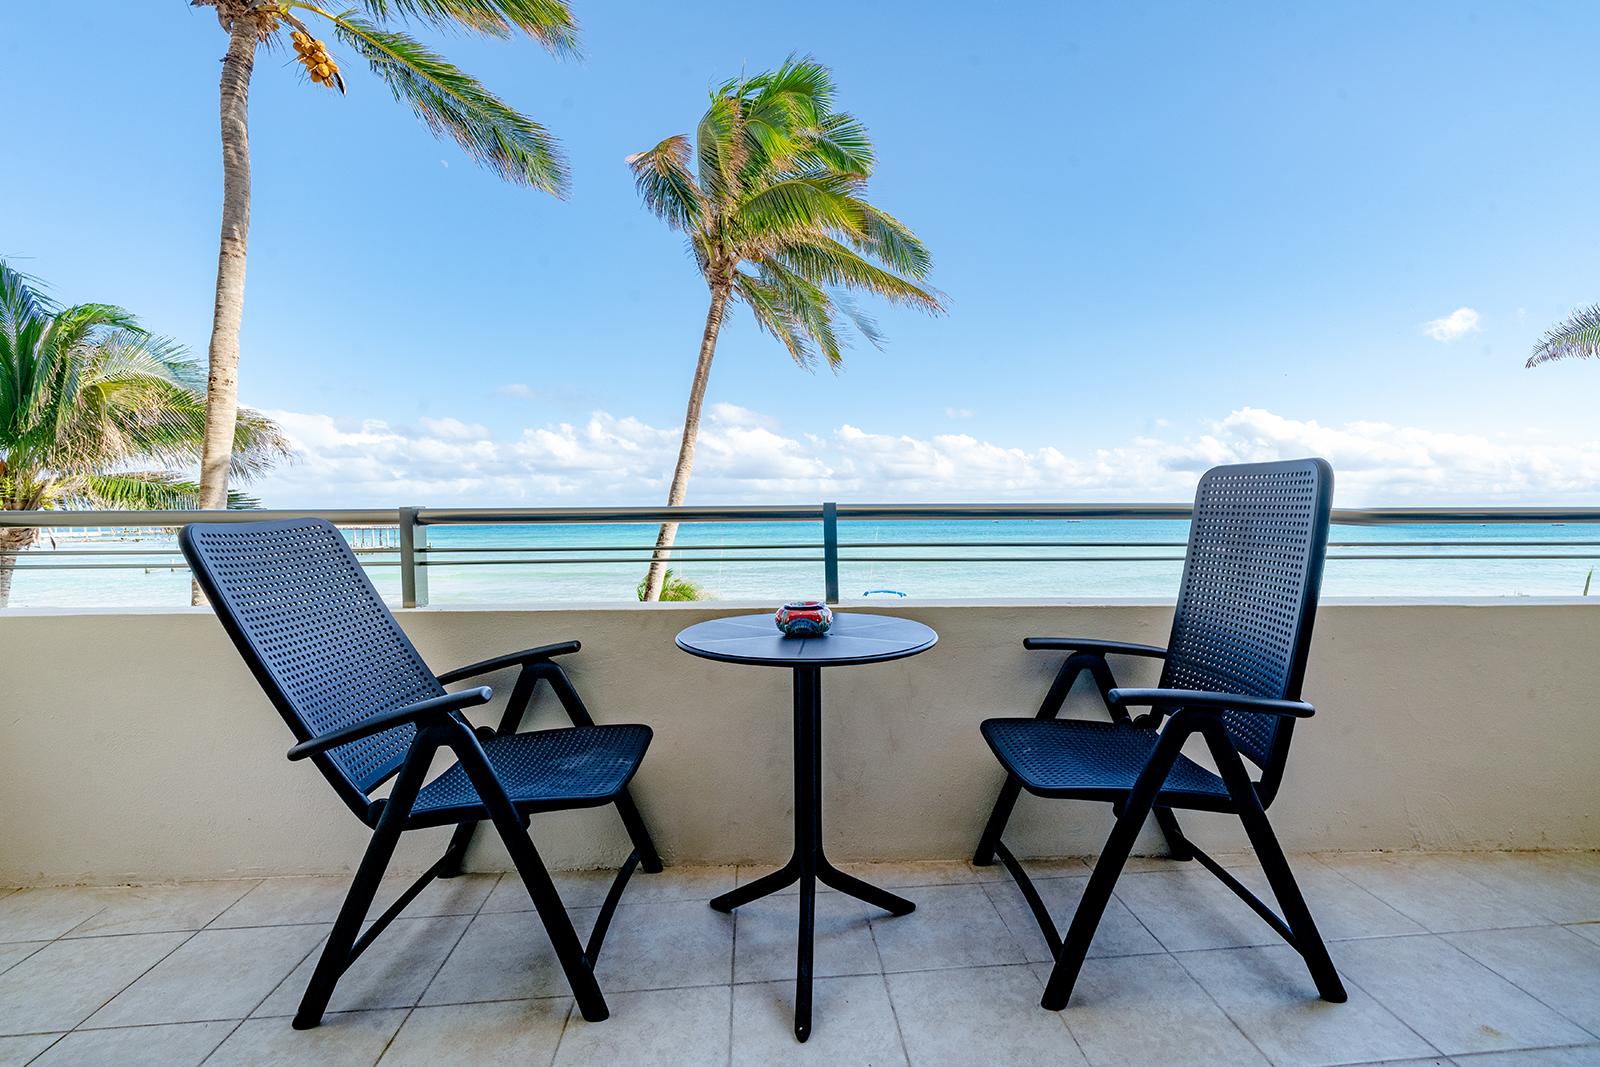 Ocean Plaza Playa del Carmen Condo Home For Sale Real Estate to Buy